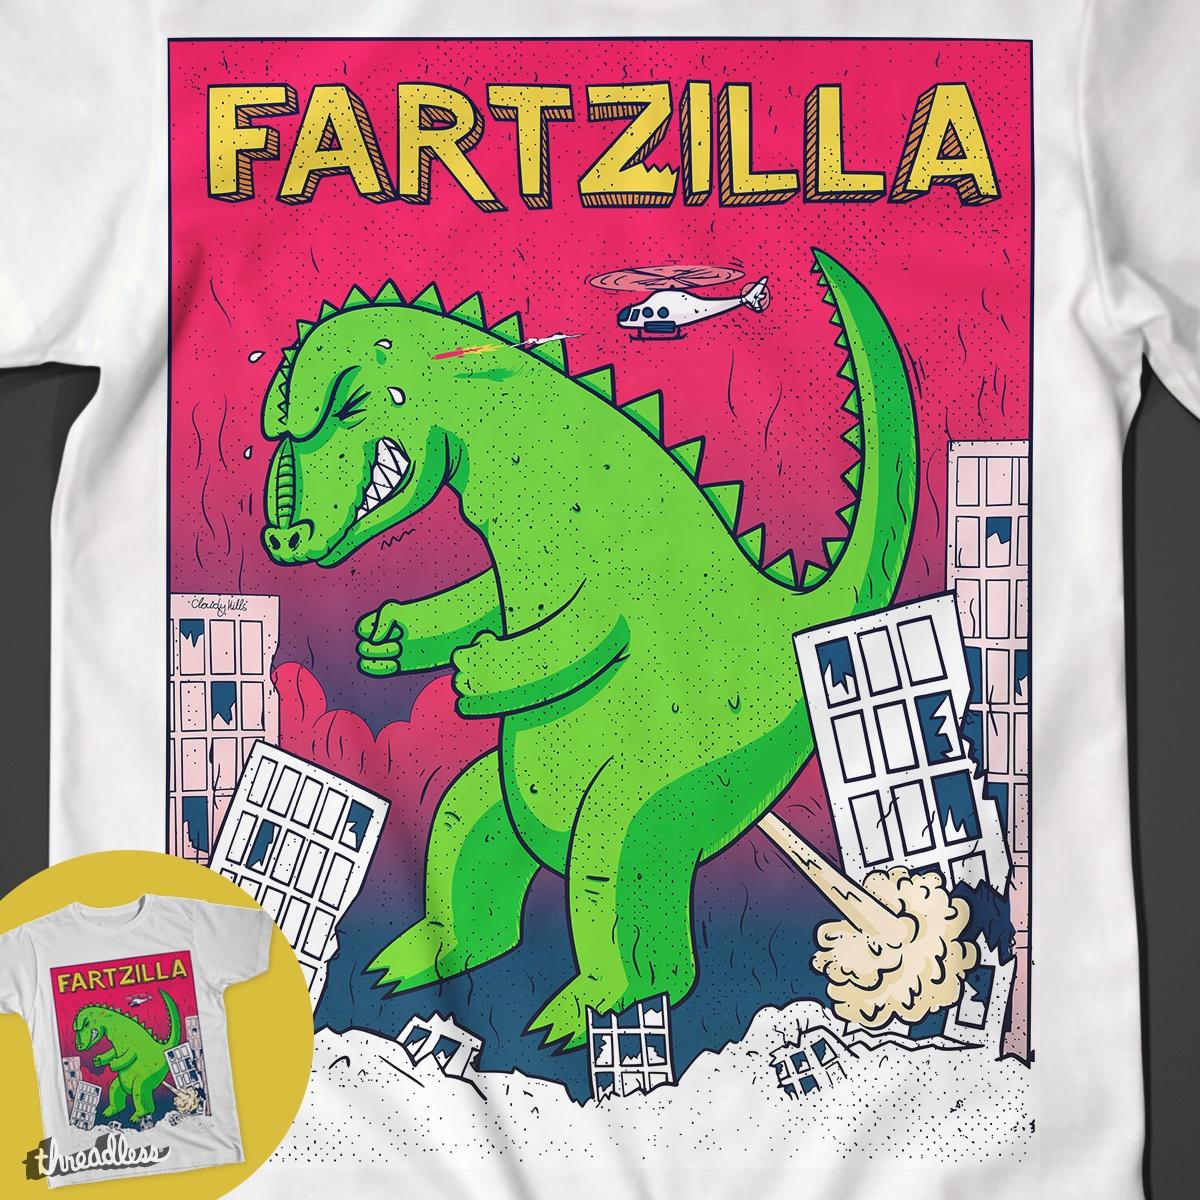 Fartzilla by FatMax on Threadless